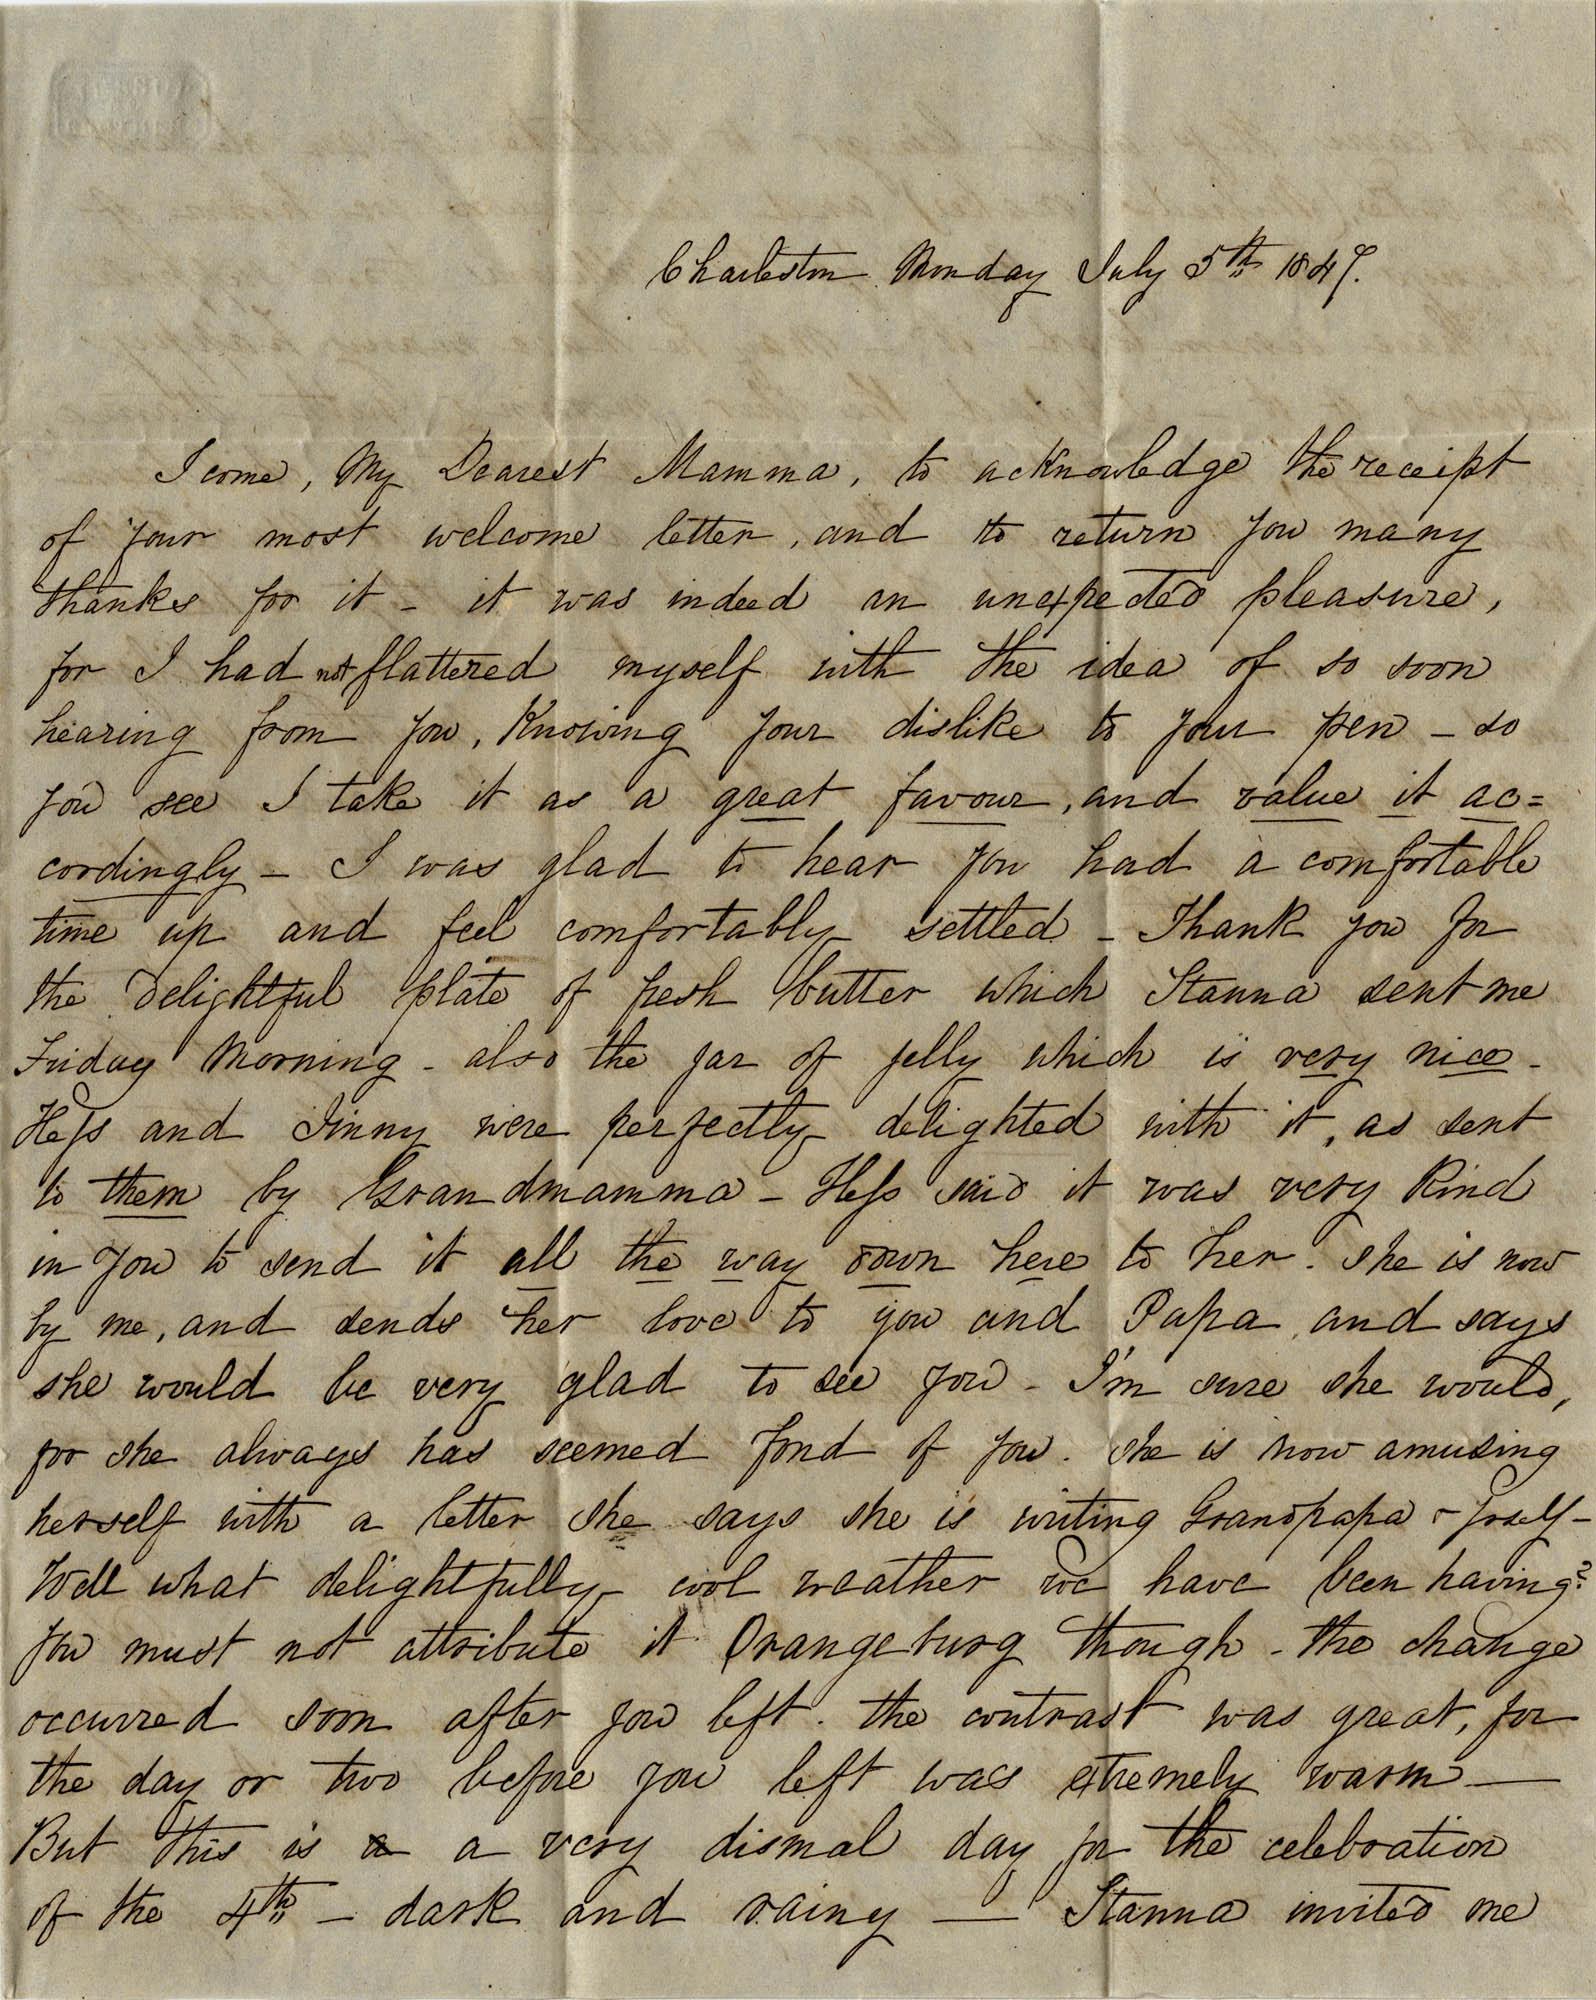 029. Virginia Wilkinson Belin to Eleanora Wilkinson -- July 5, 1847